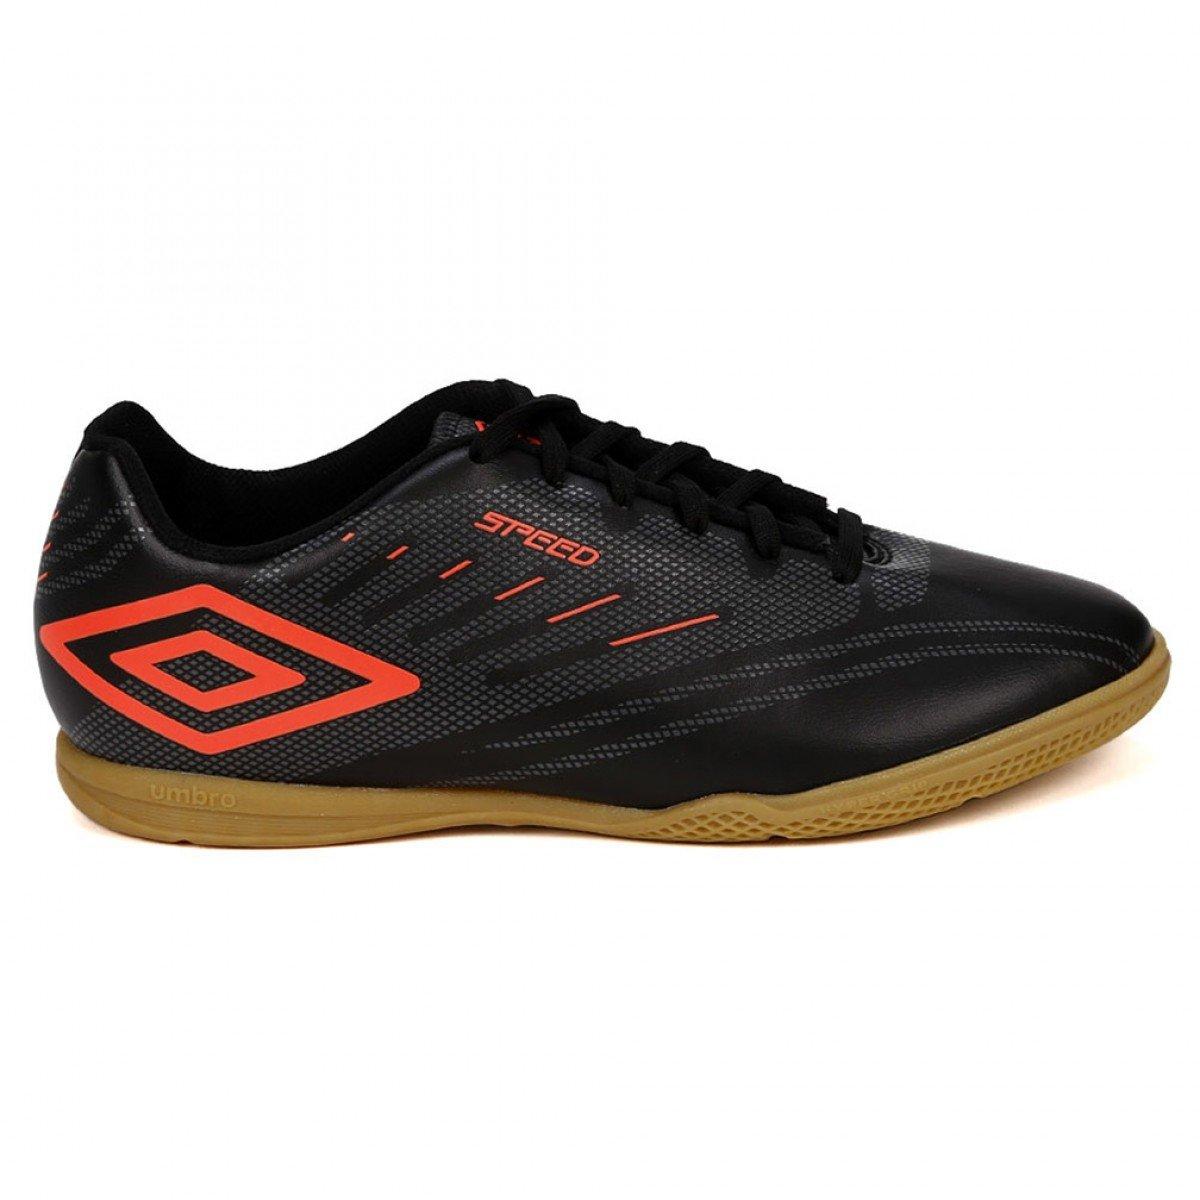 d04d7e85b8 Chuteira Futsal Umbro Speed IV Preto e Coral - Compre Agora